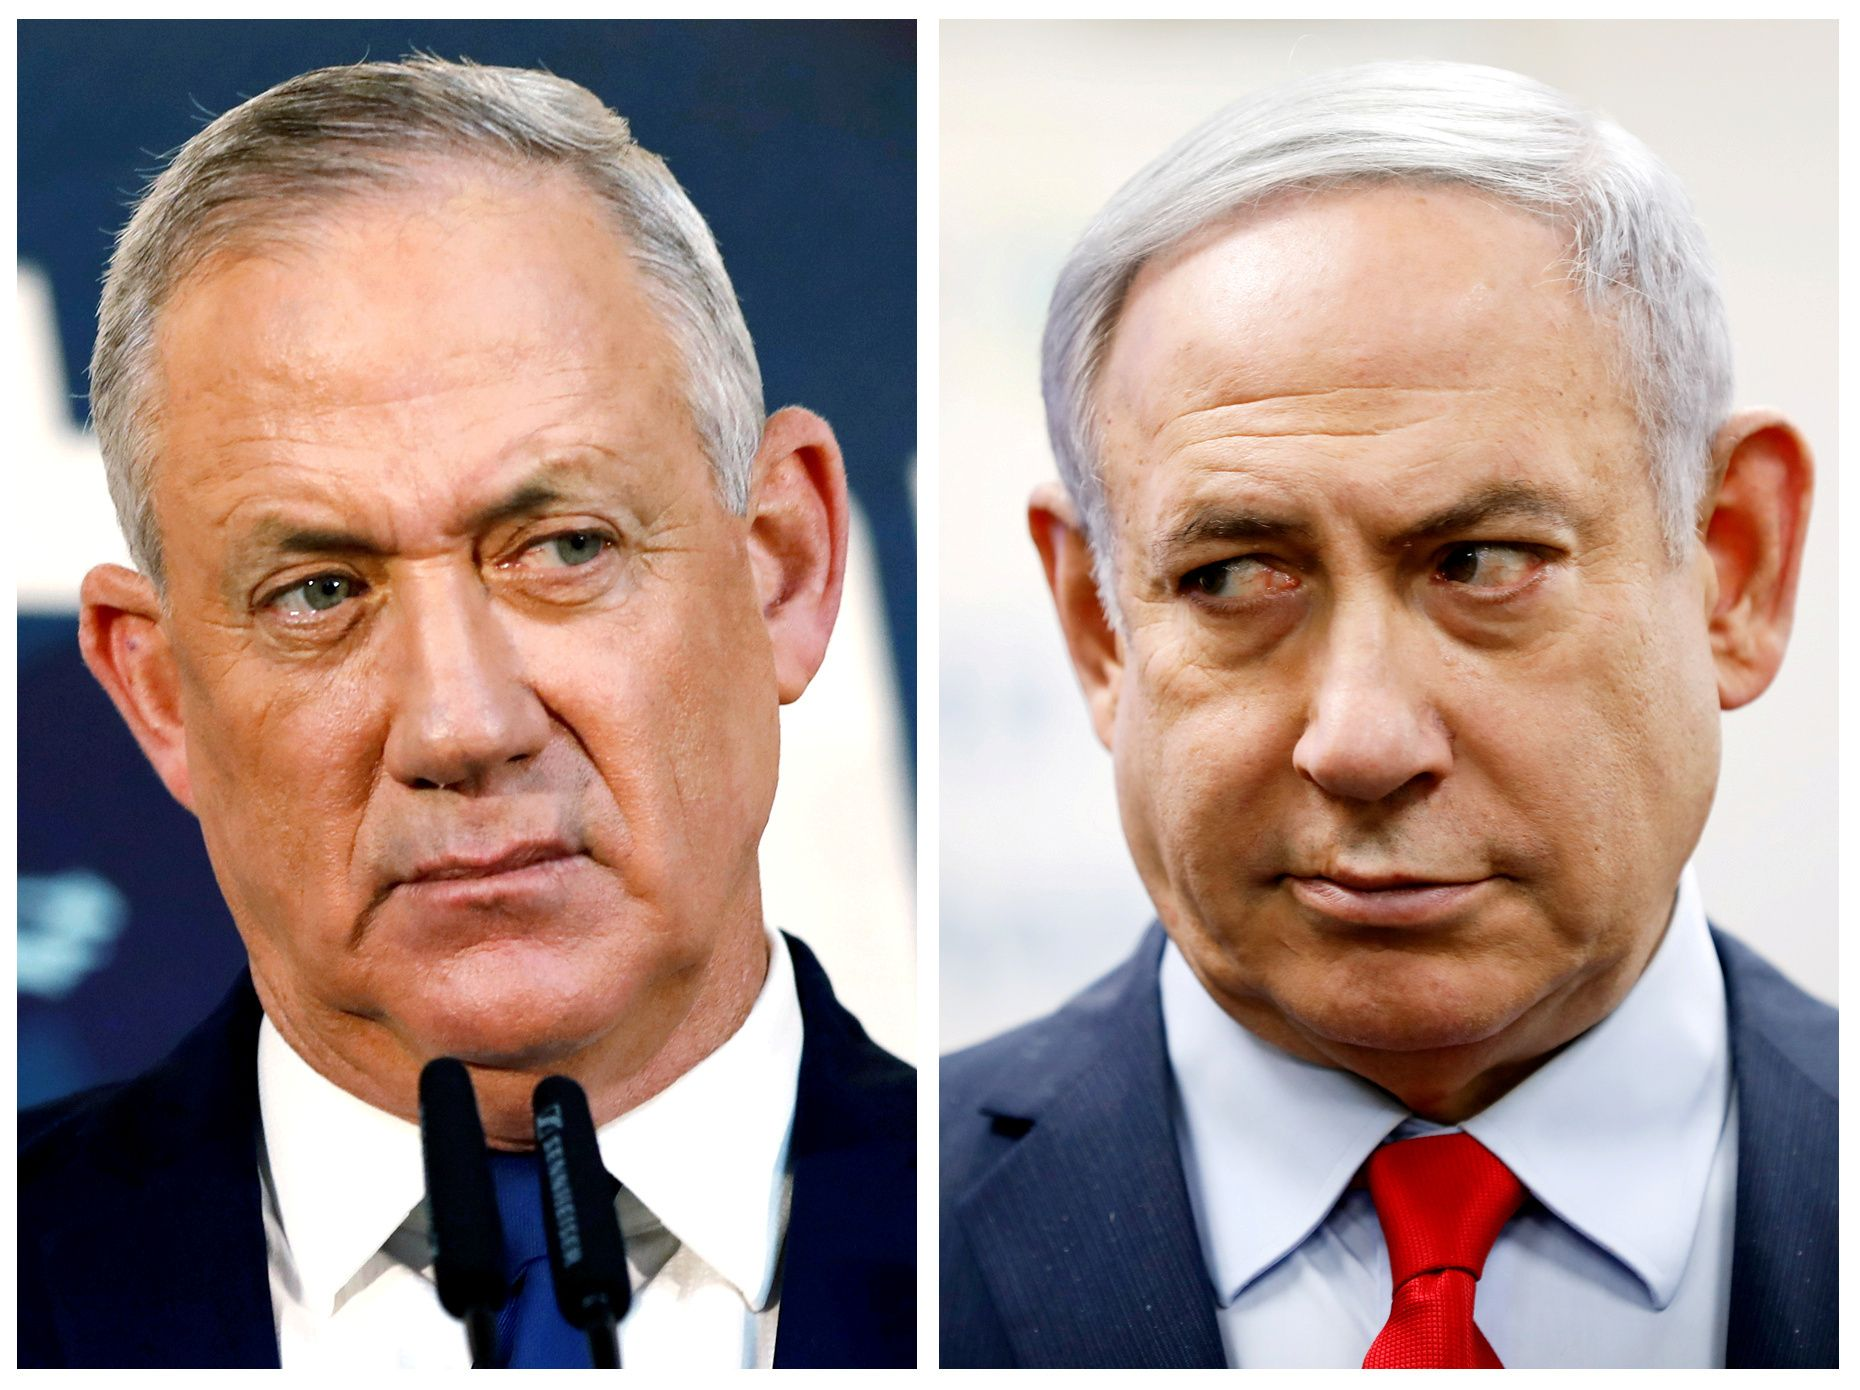 The coronavirus cures Israeli deadlock